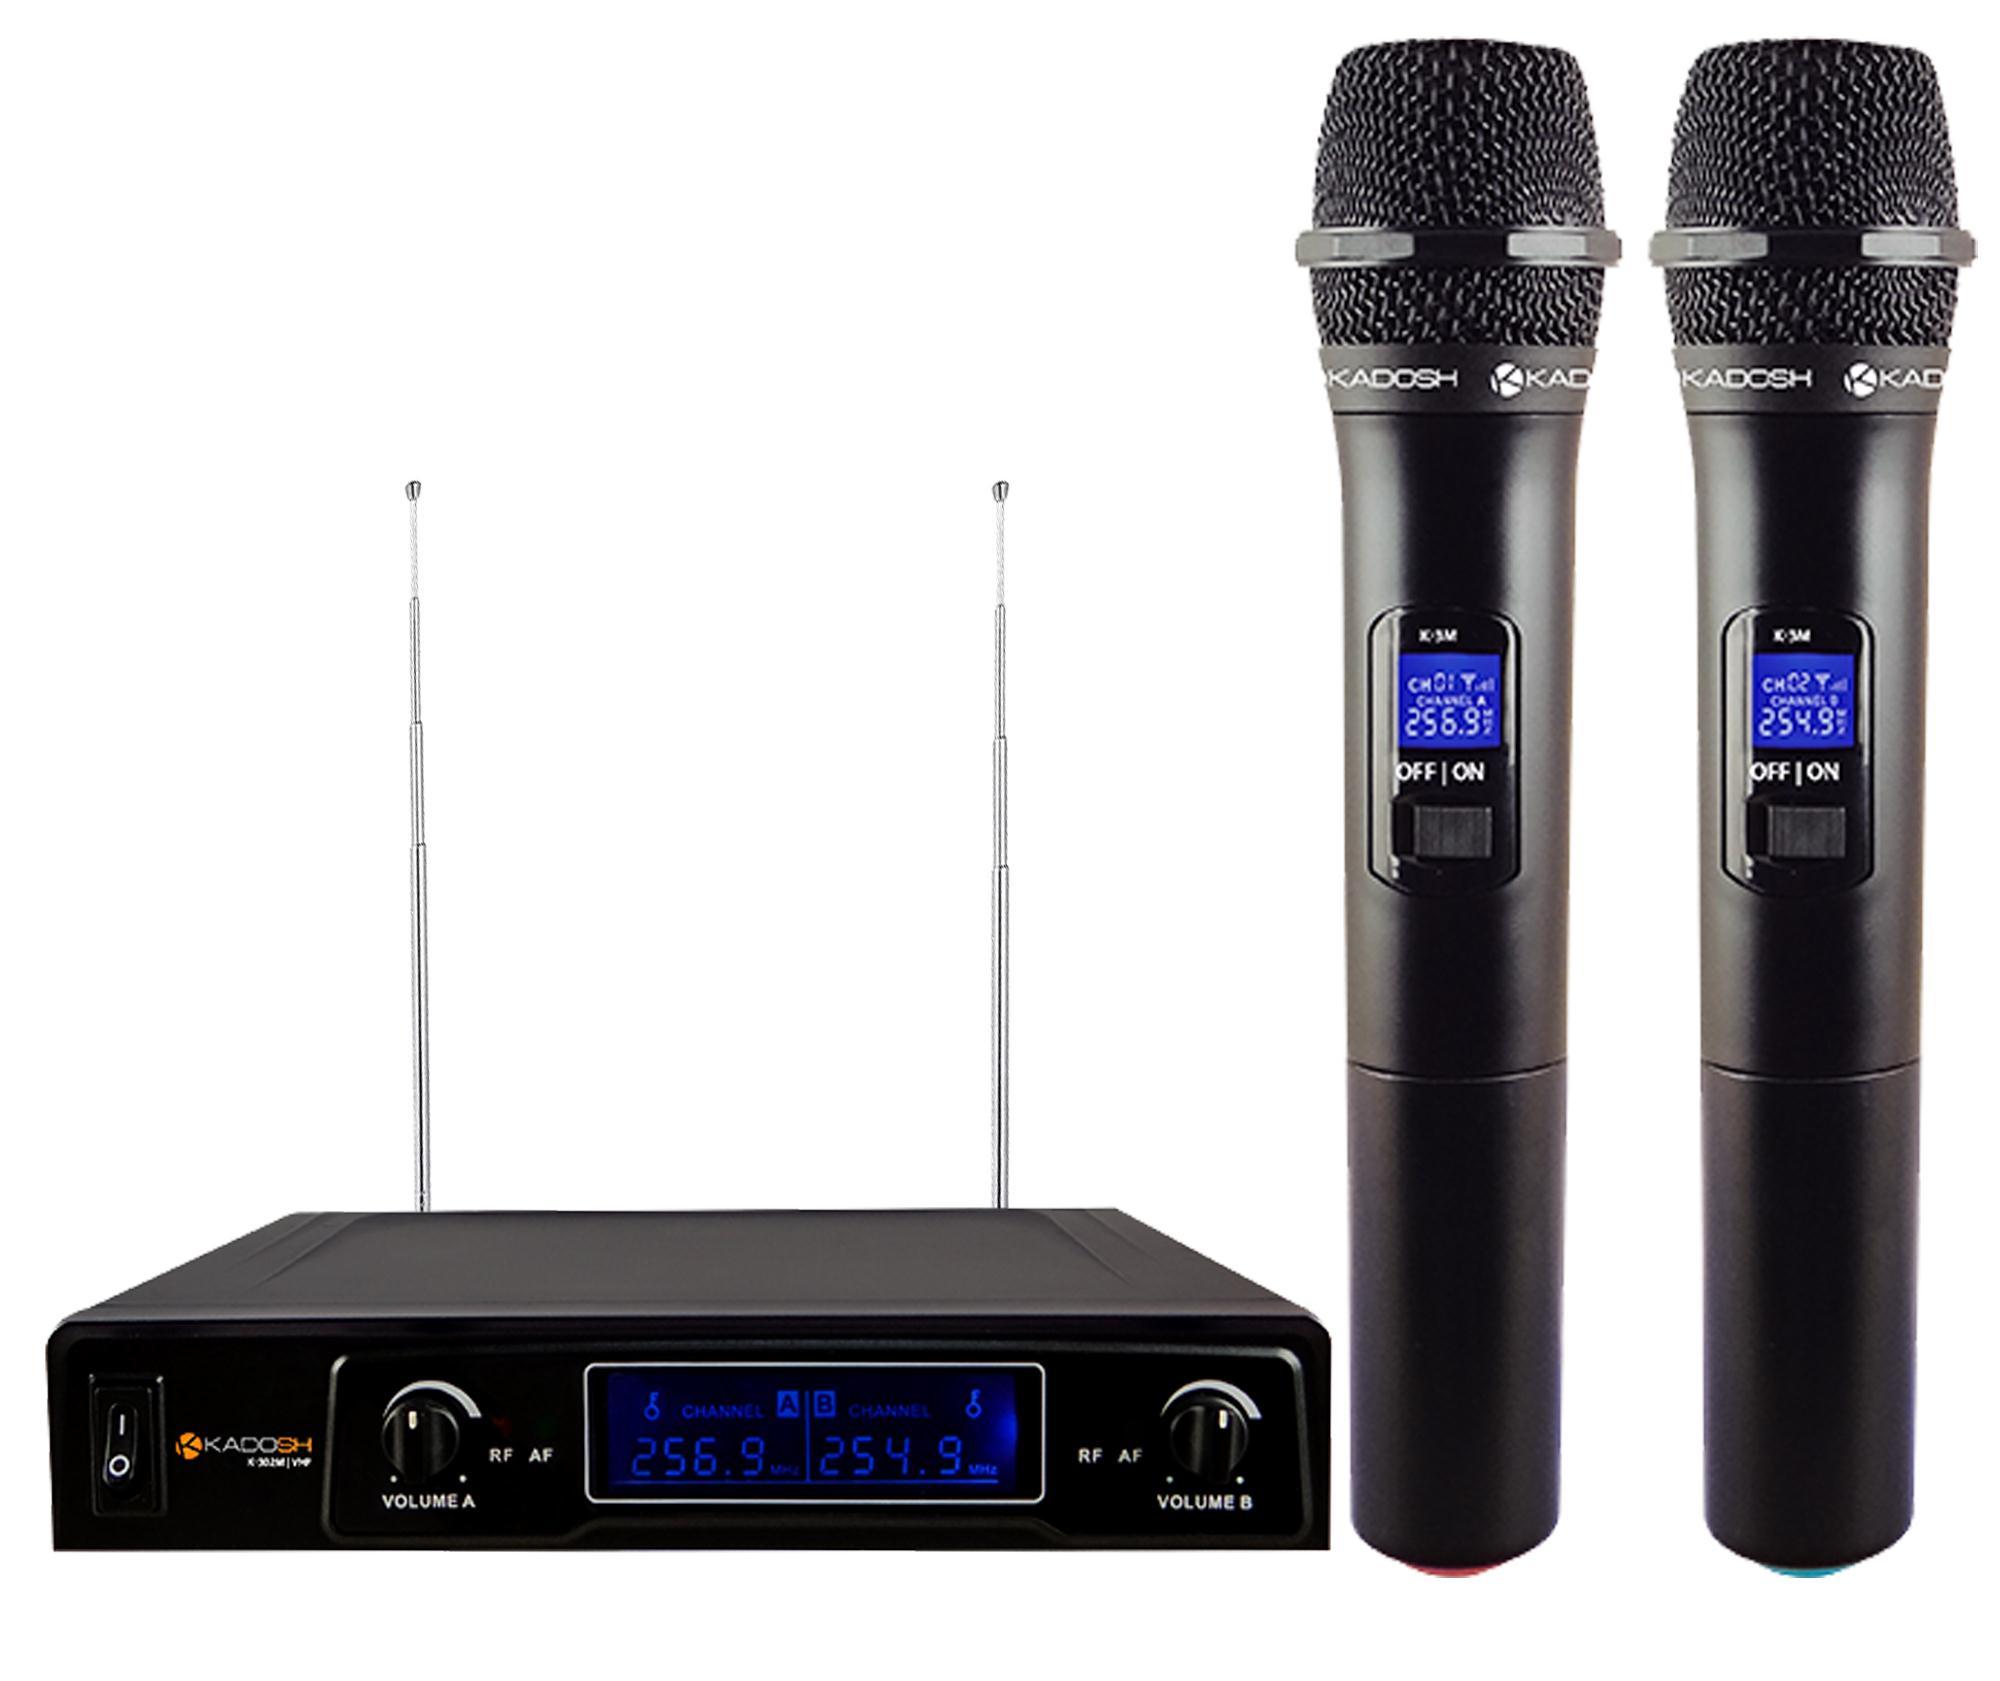 Kadosh Microfone Sem Fio Duplo K-302M (VHF/Display Digital)